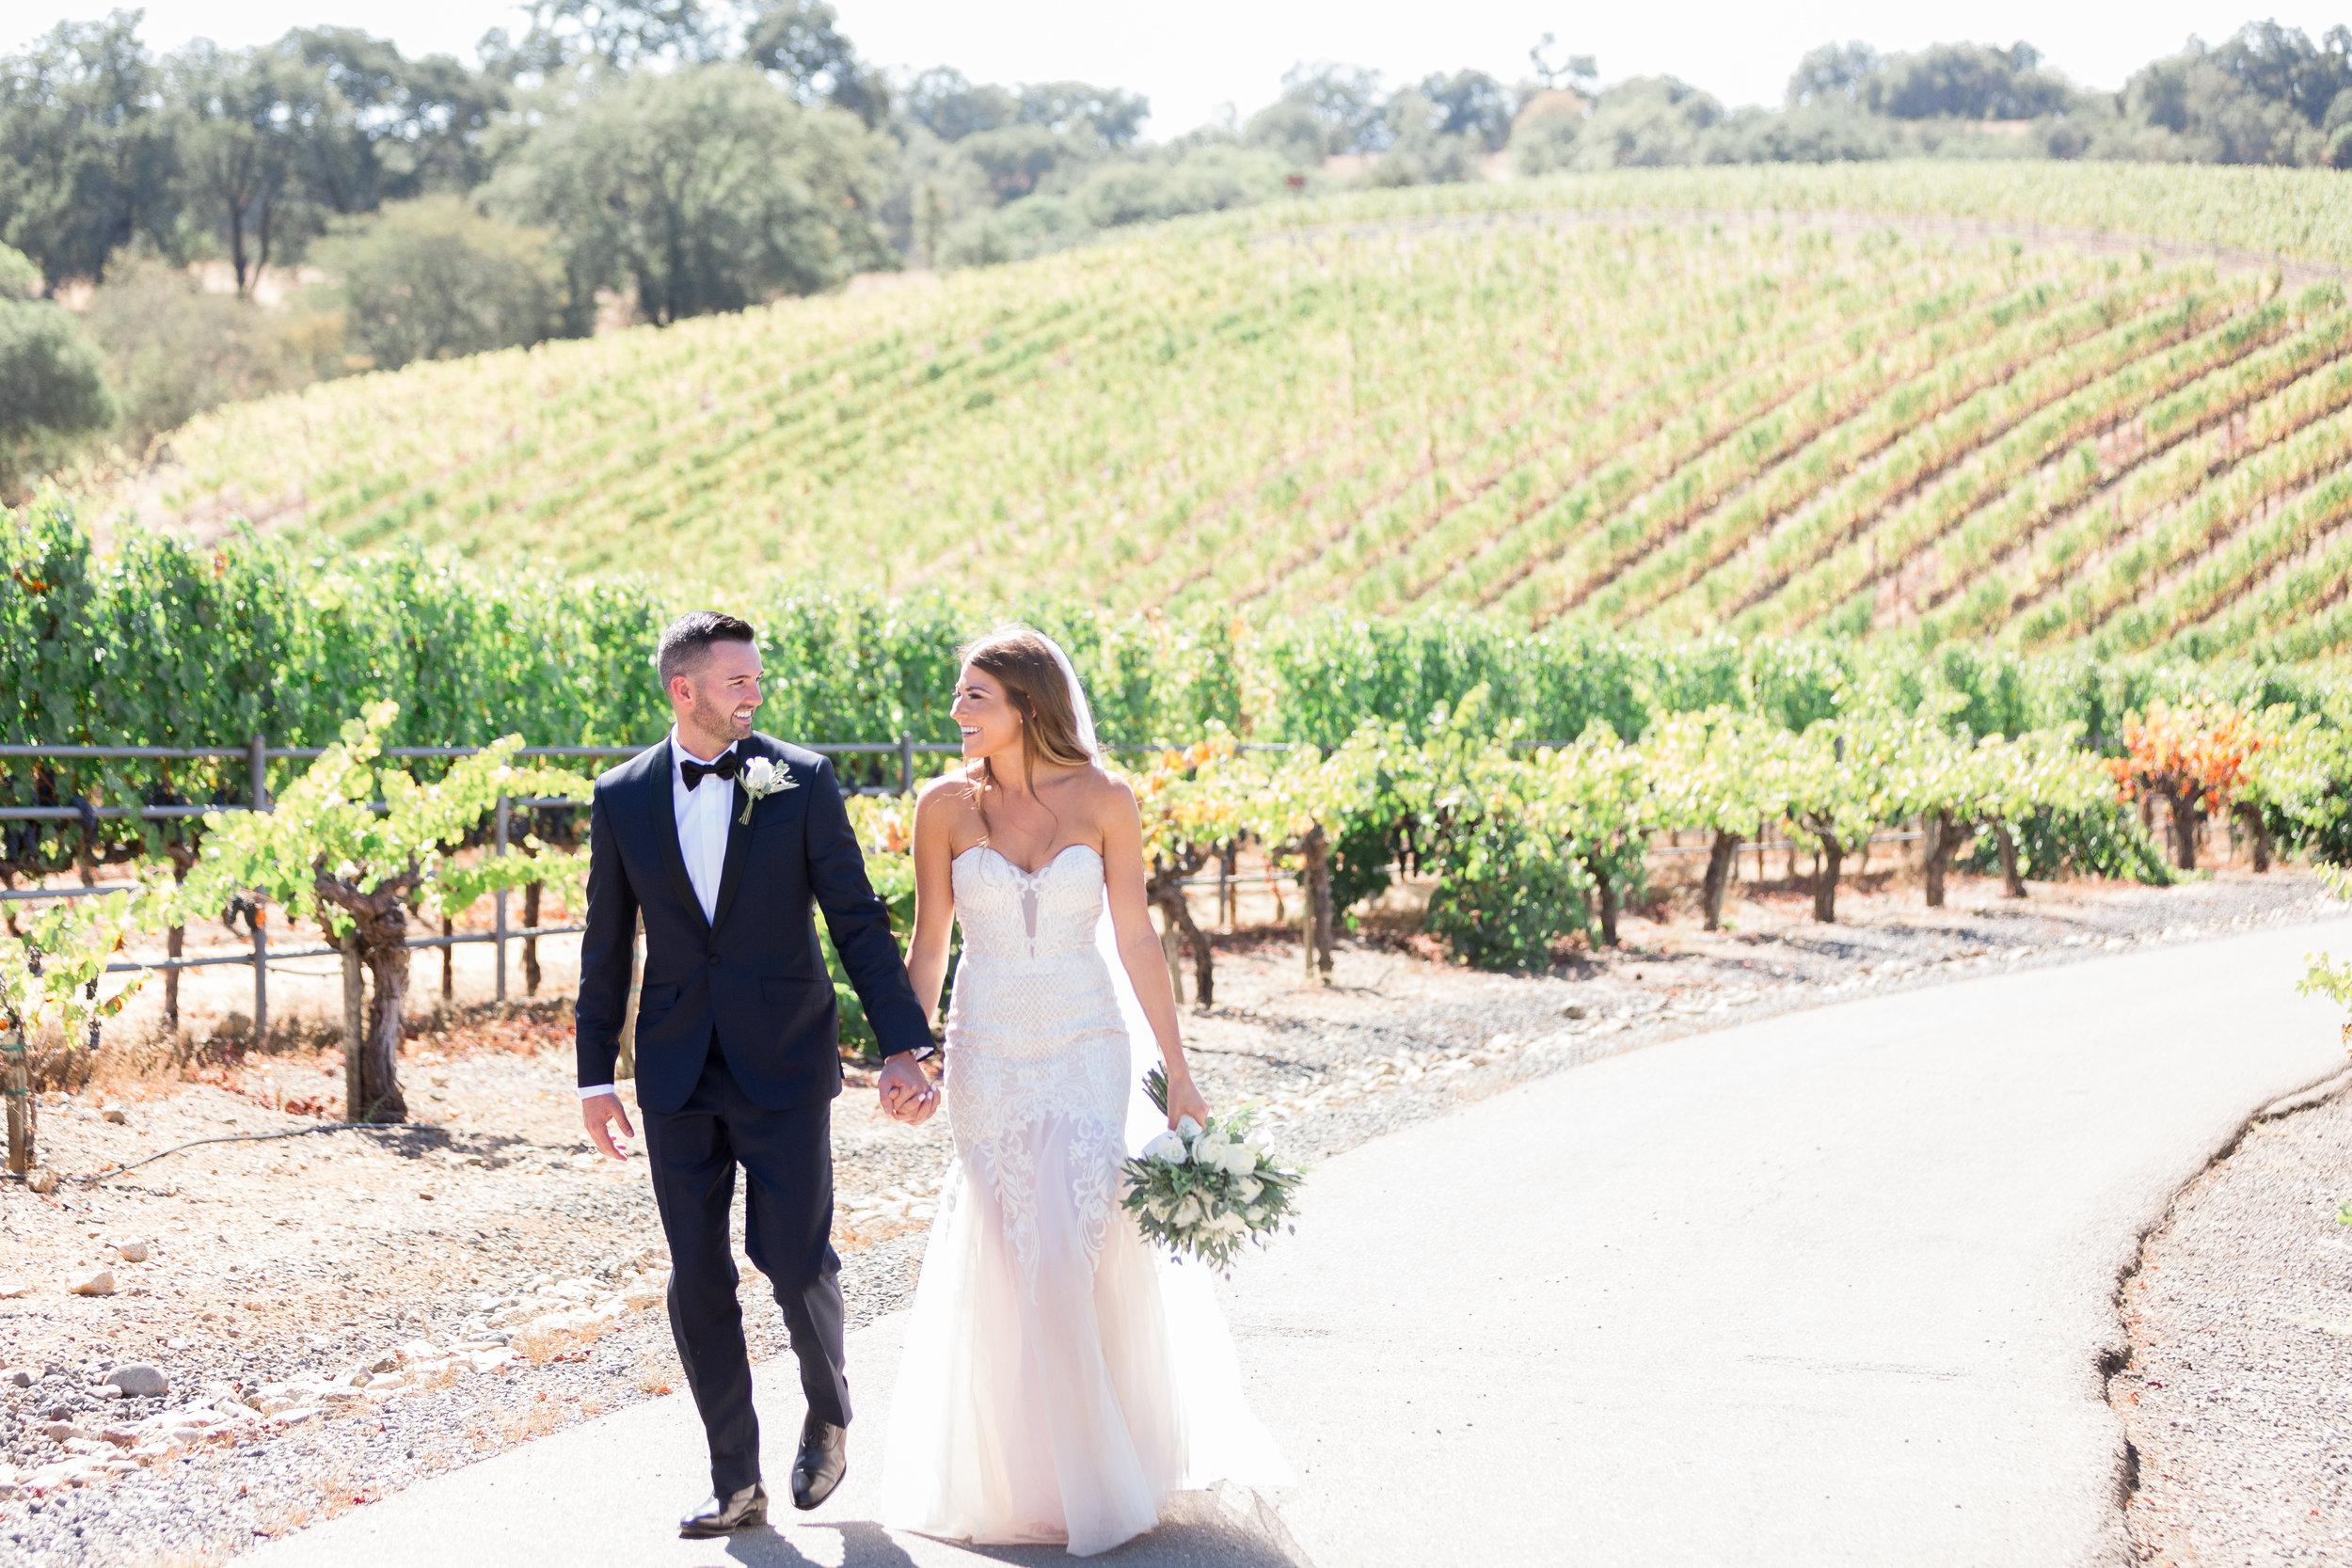 Calegari-Vineyards-Healdsburg-Wedding-Photographer (84 of 262).jpg